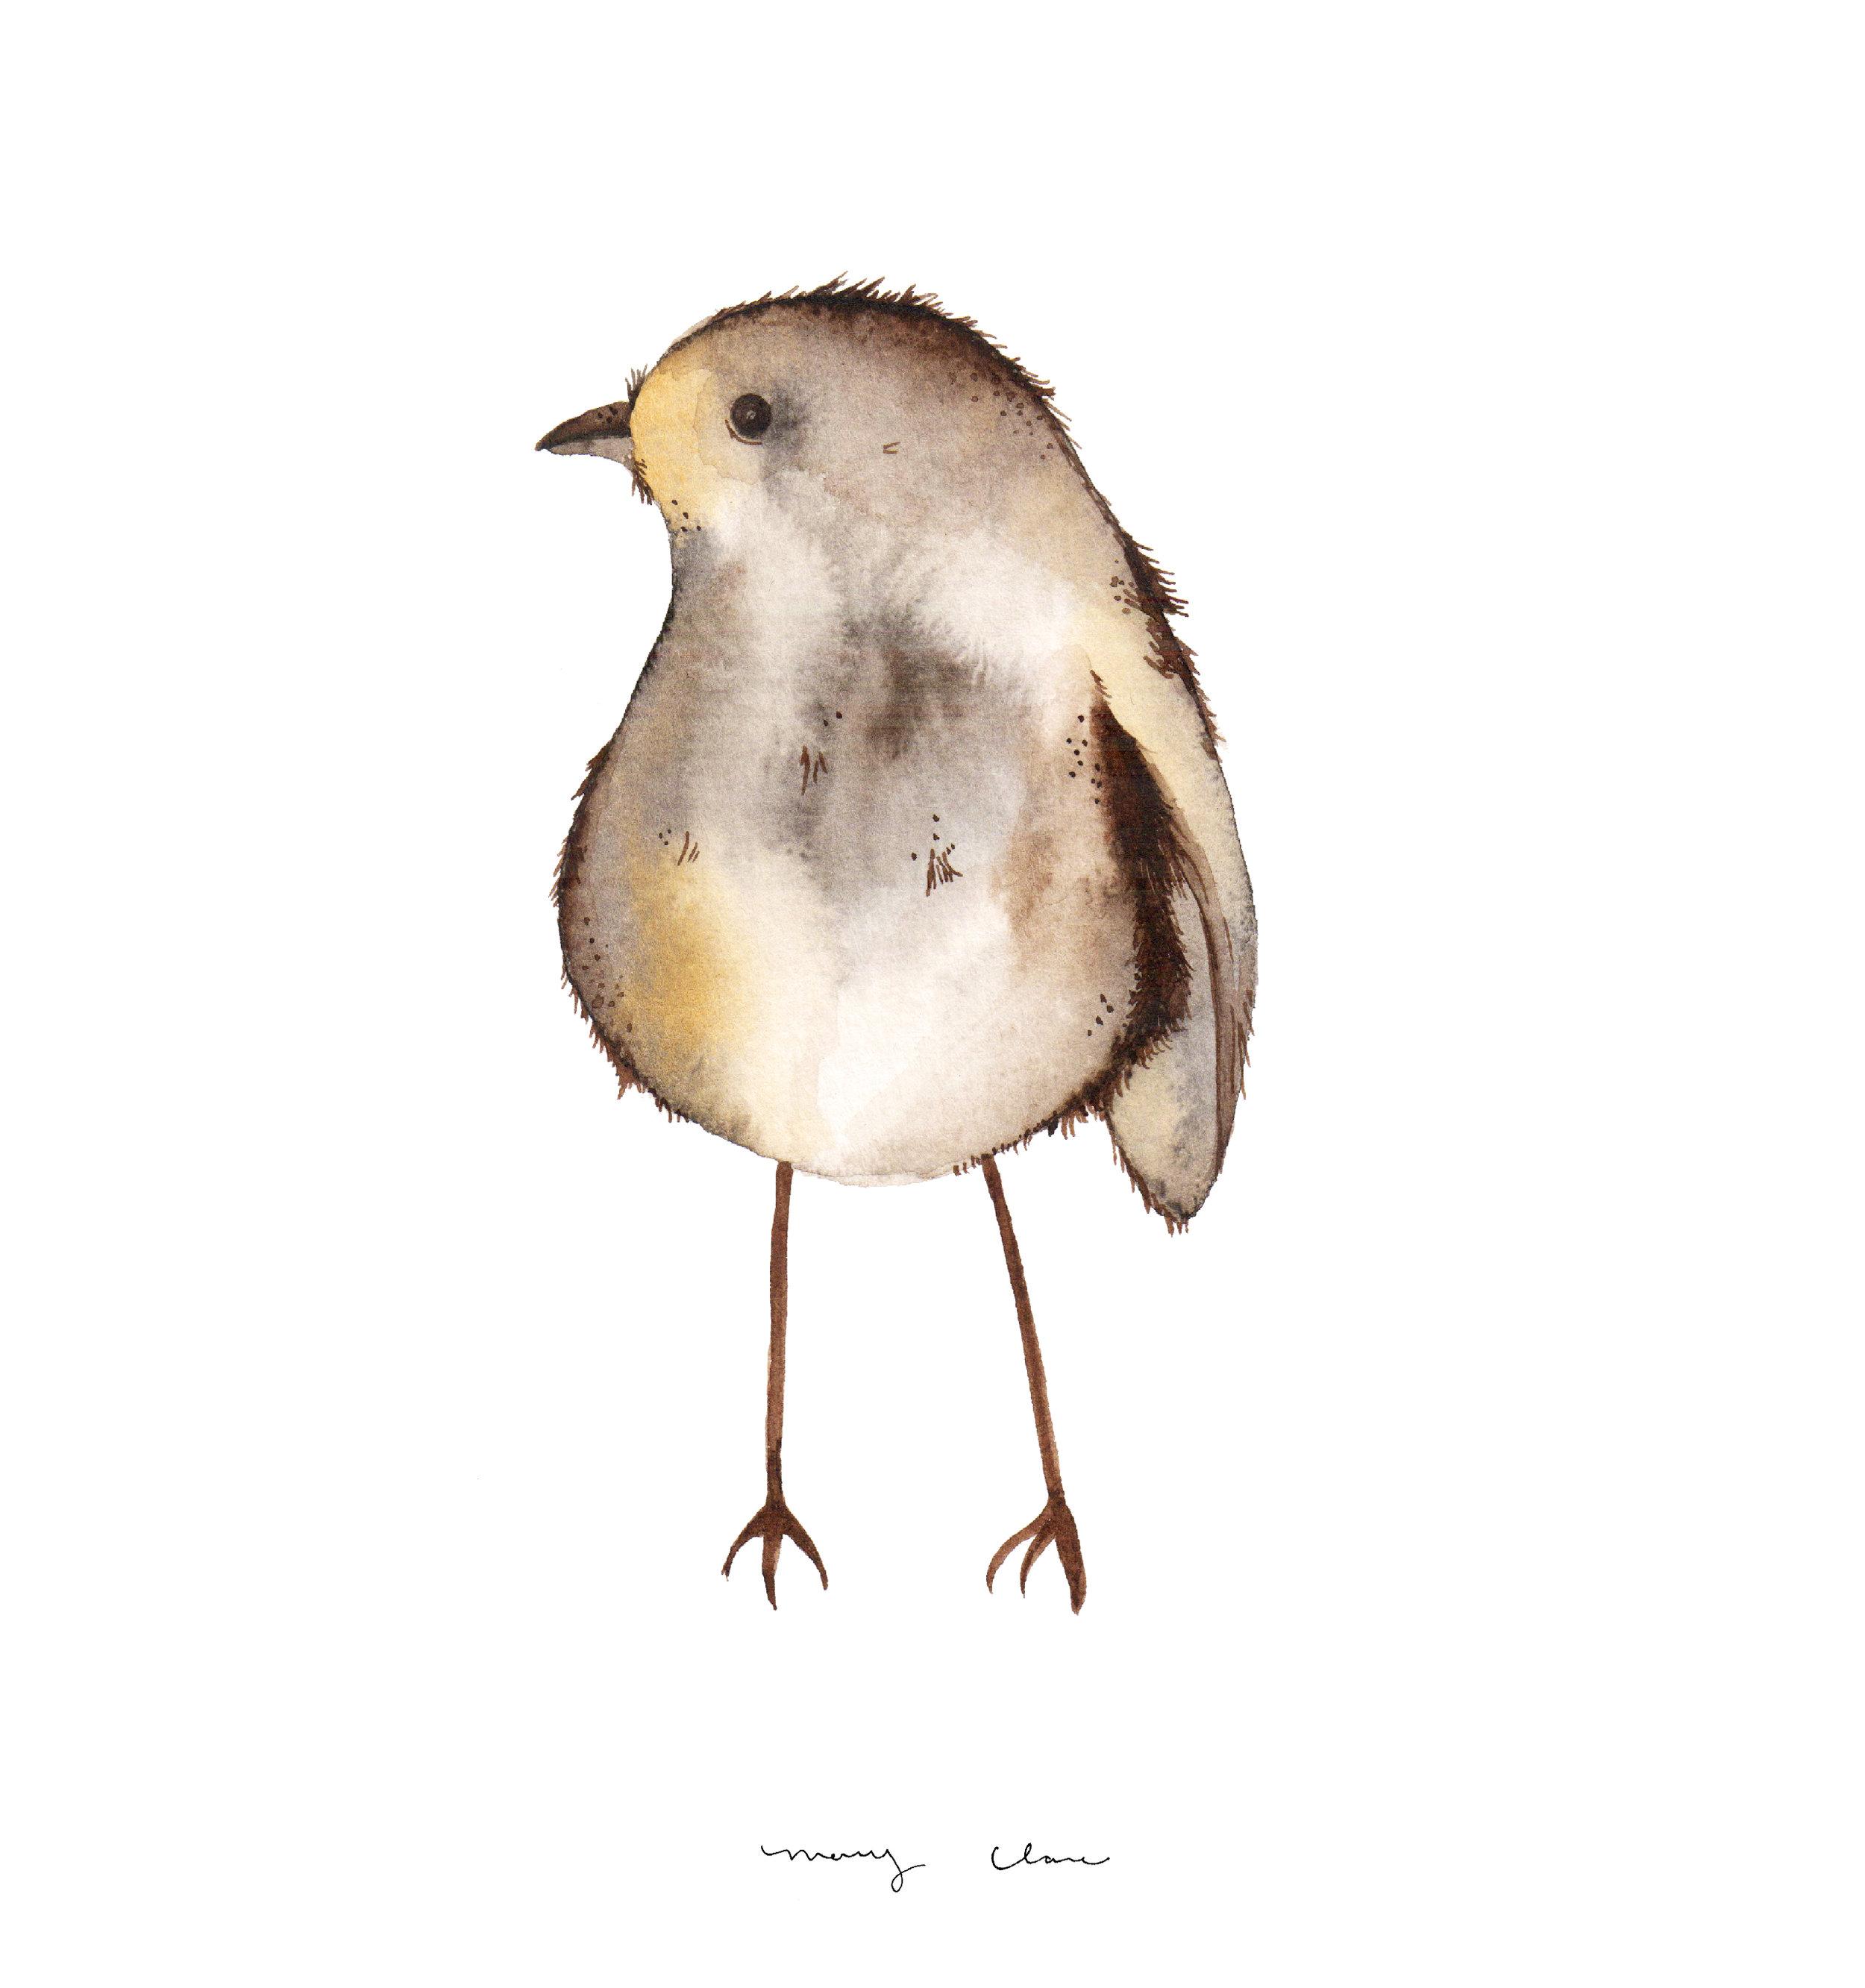 woodlandBirds-maryclarewilkie-03.jpg